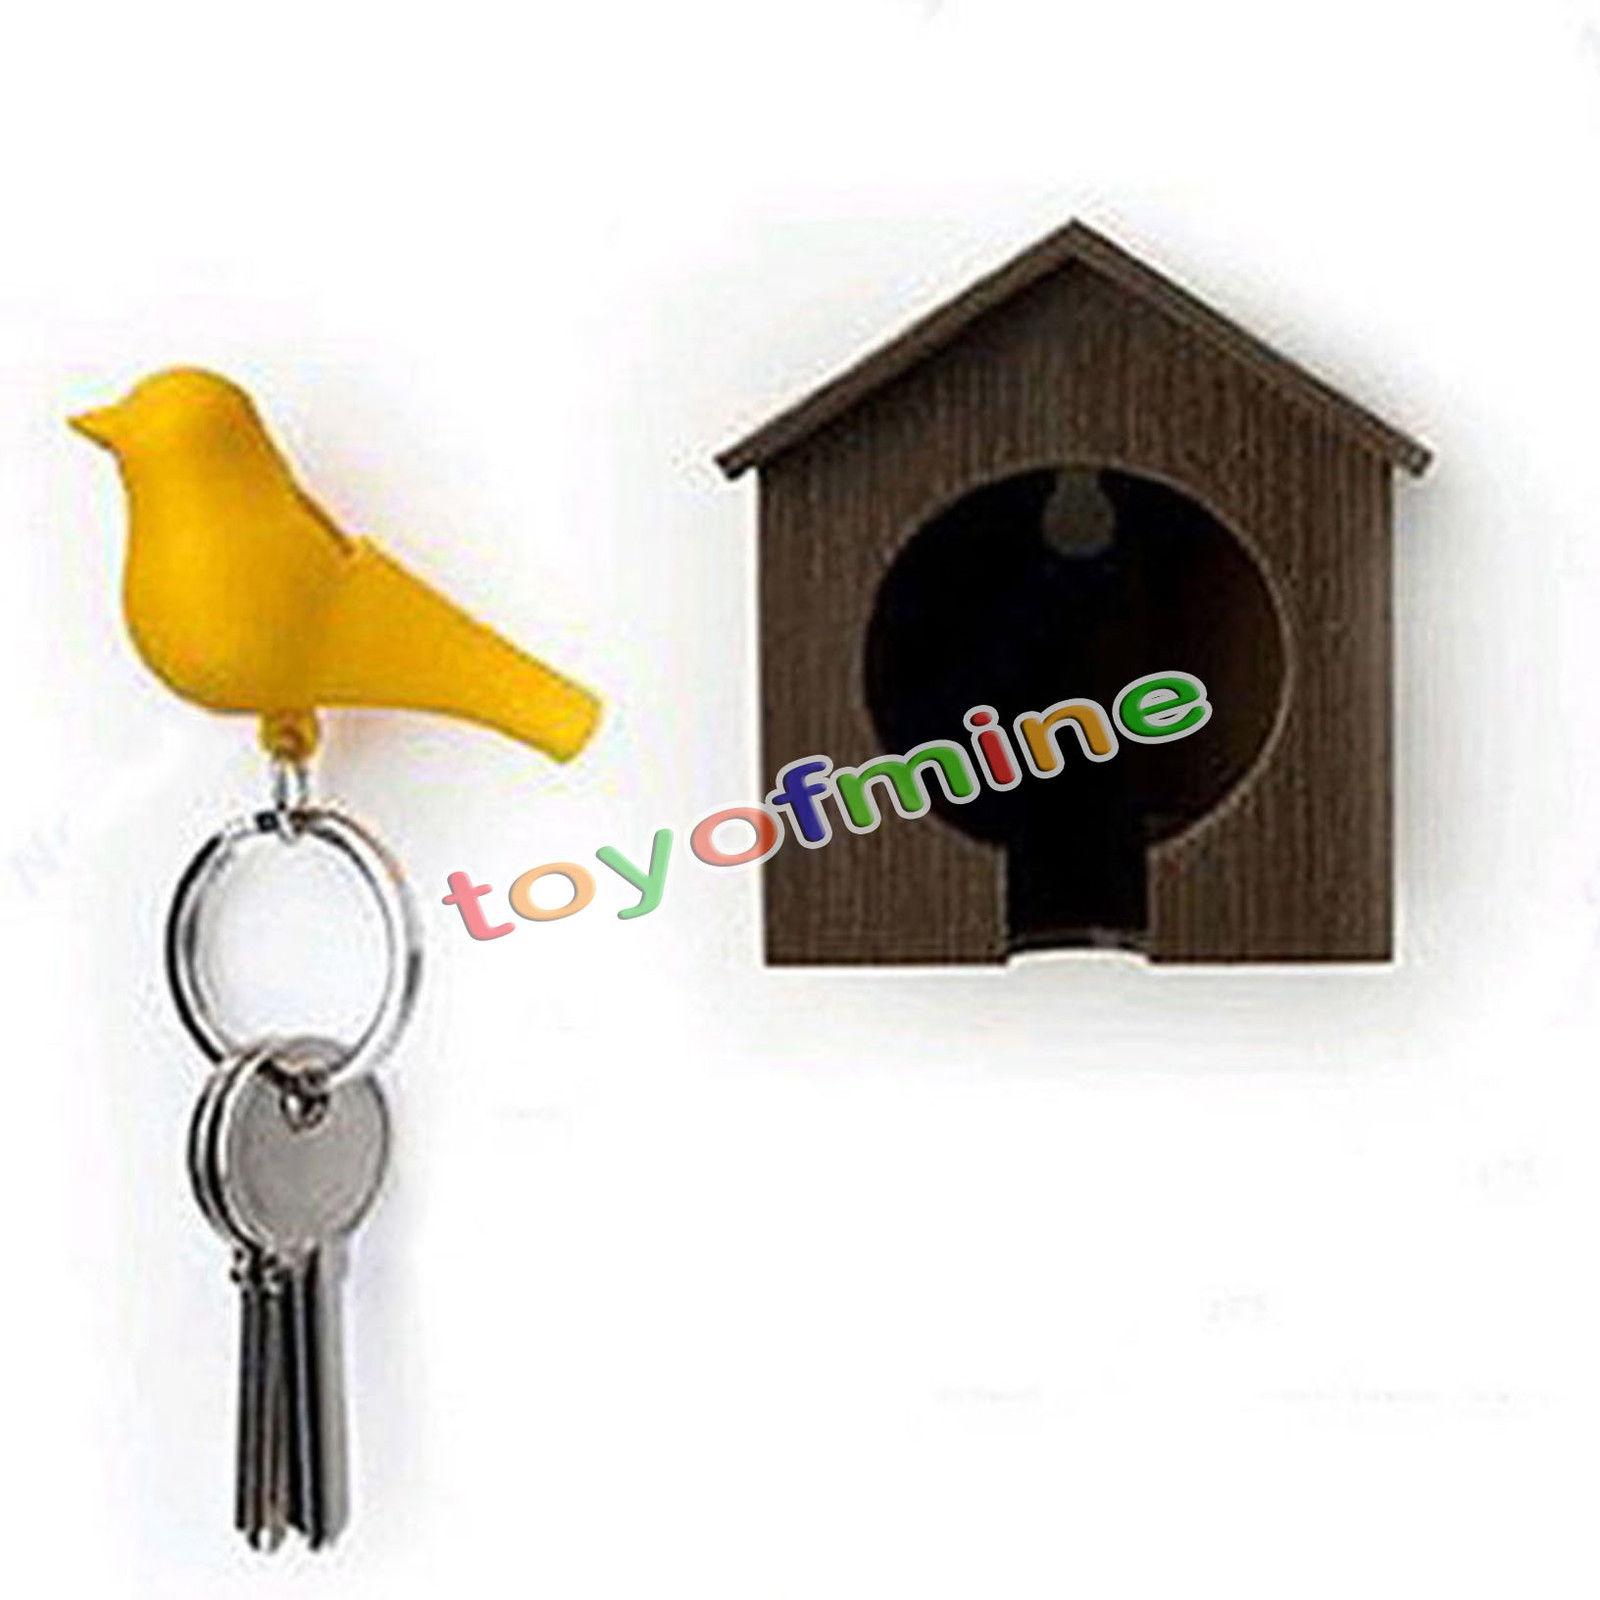 Key Holder For Wall Aliexpresscom Buy Fashion Plastic Whistle Home House Birds Nest